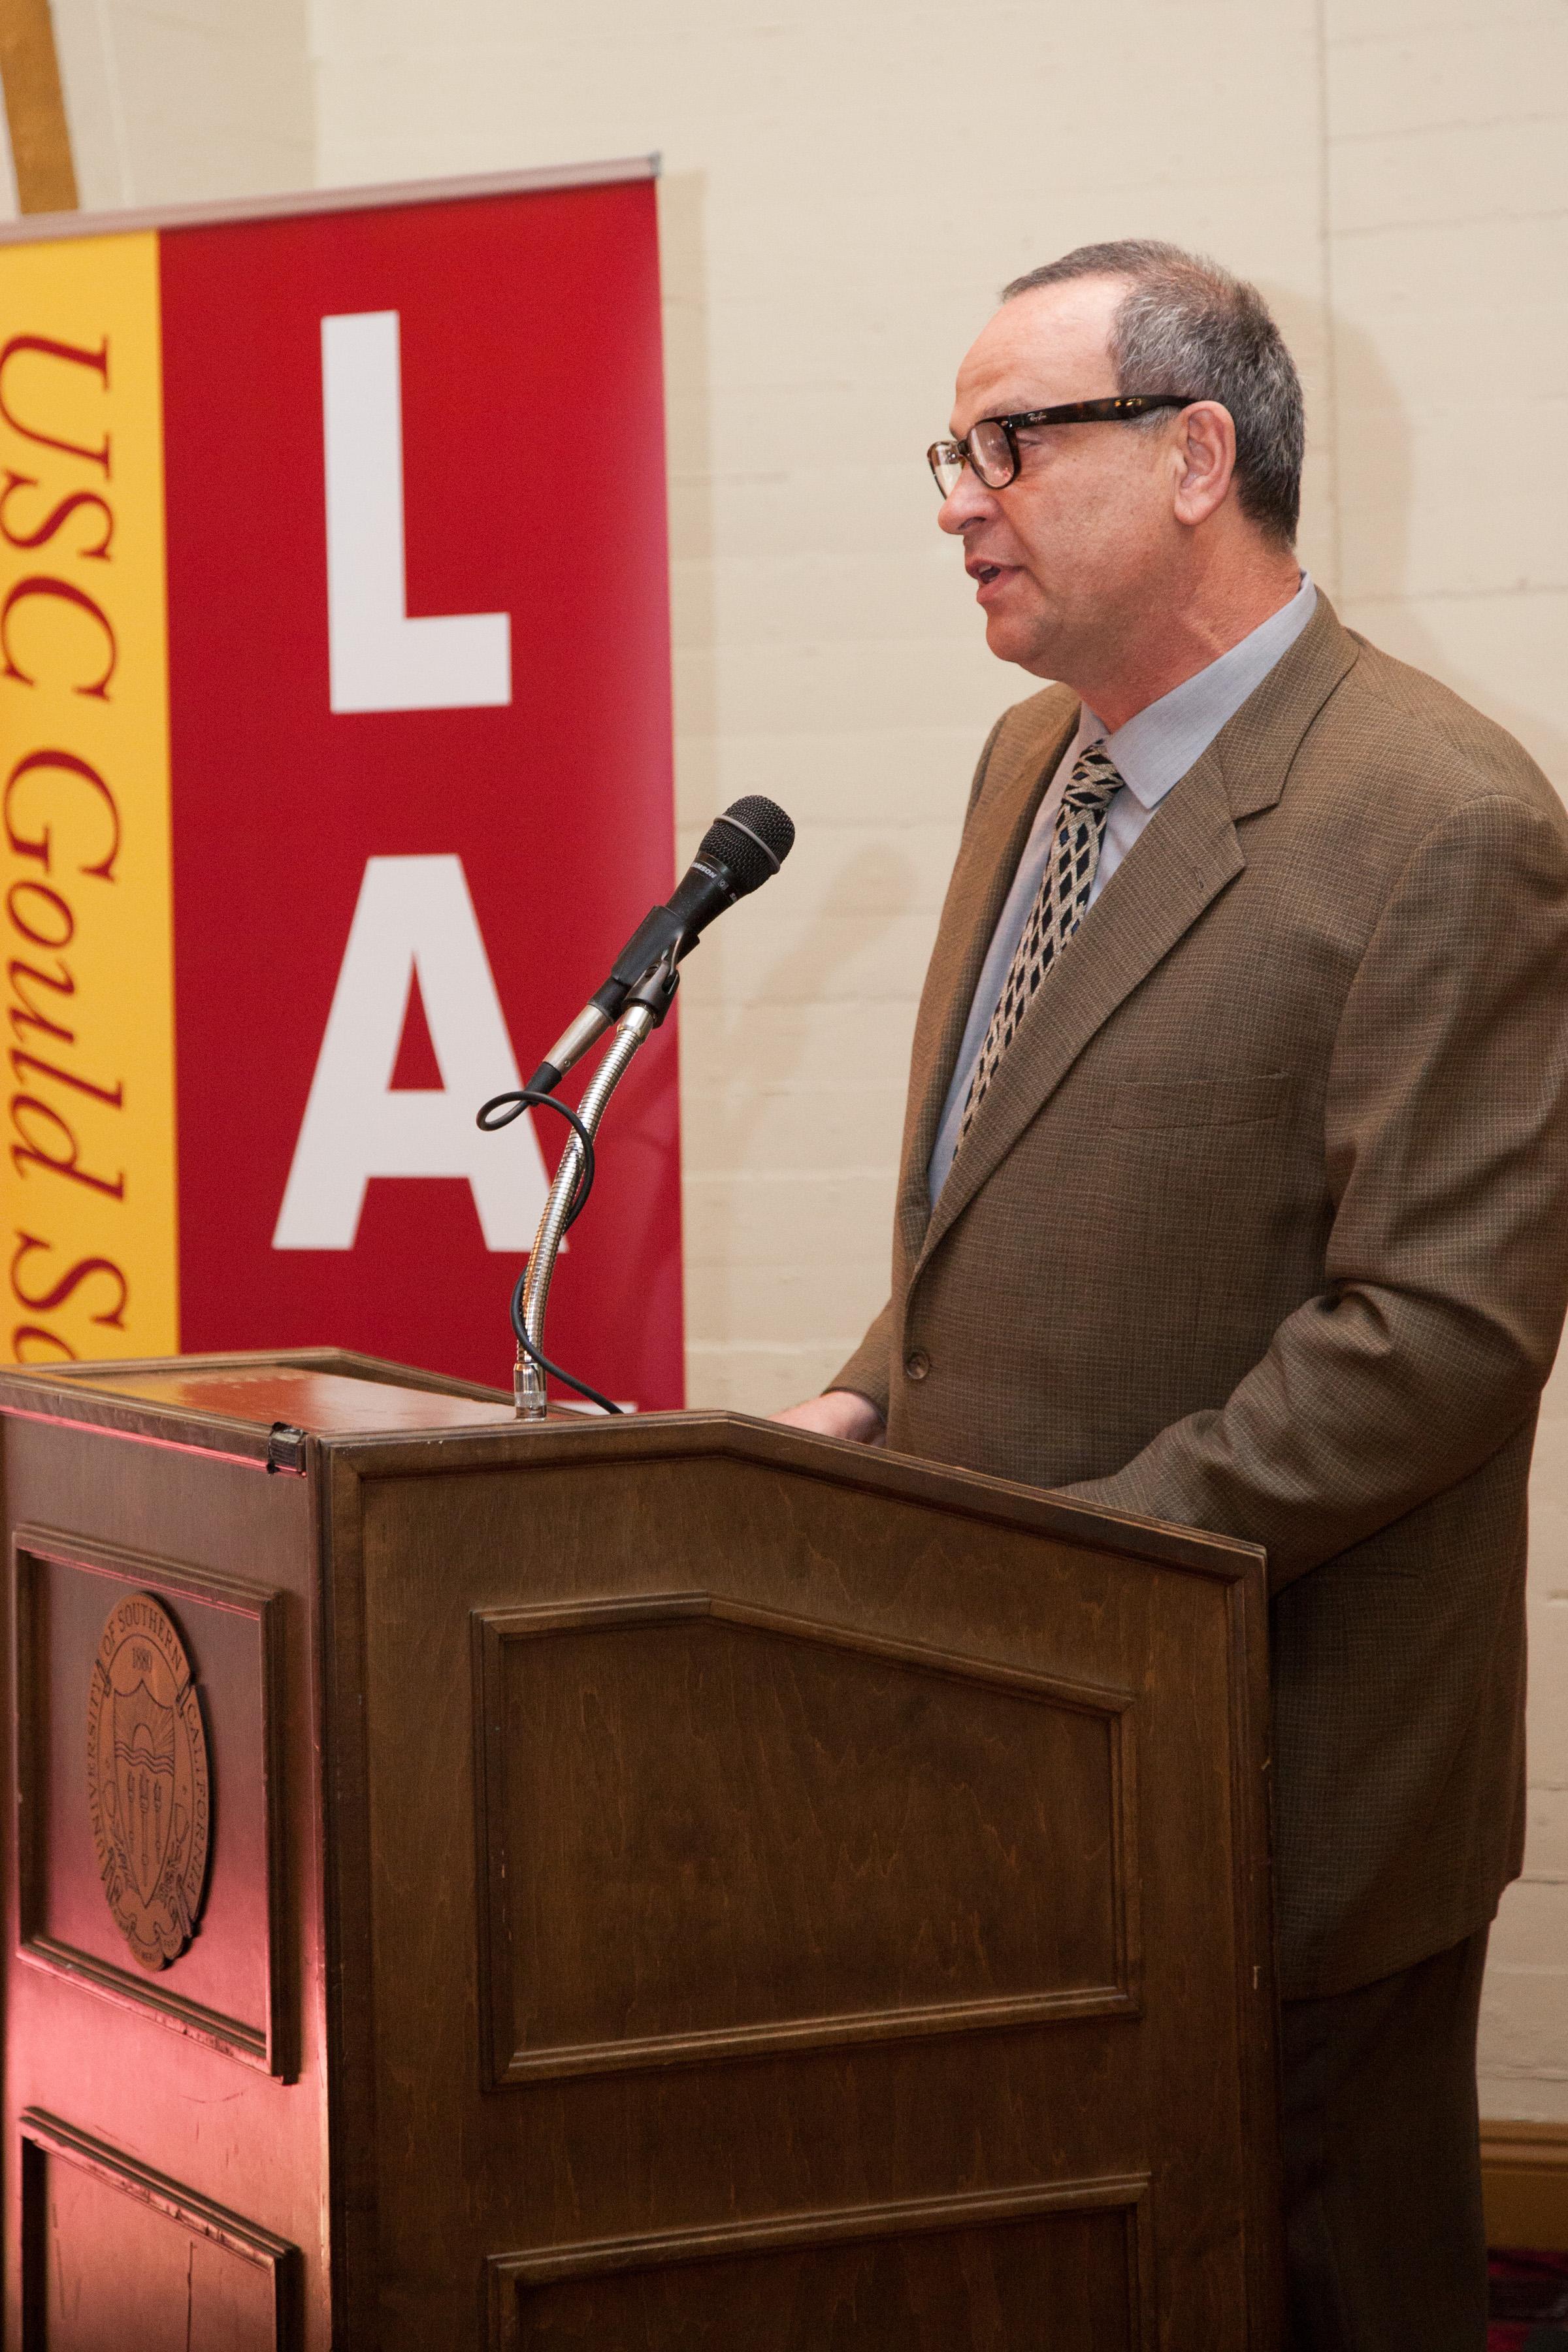 Simon installed as Crutcher Professor - USC News